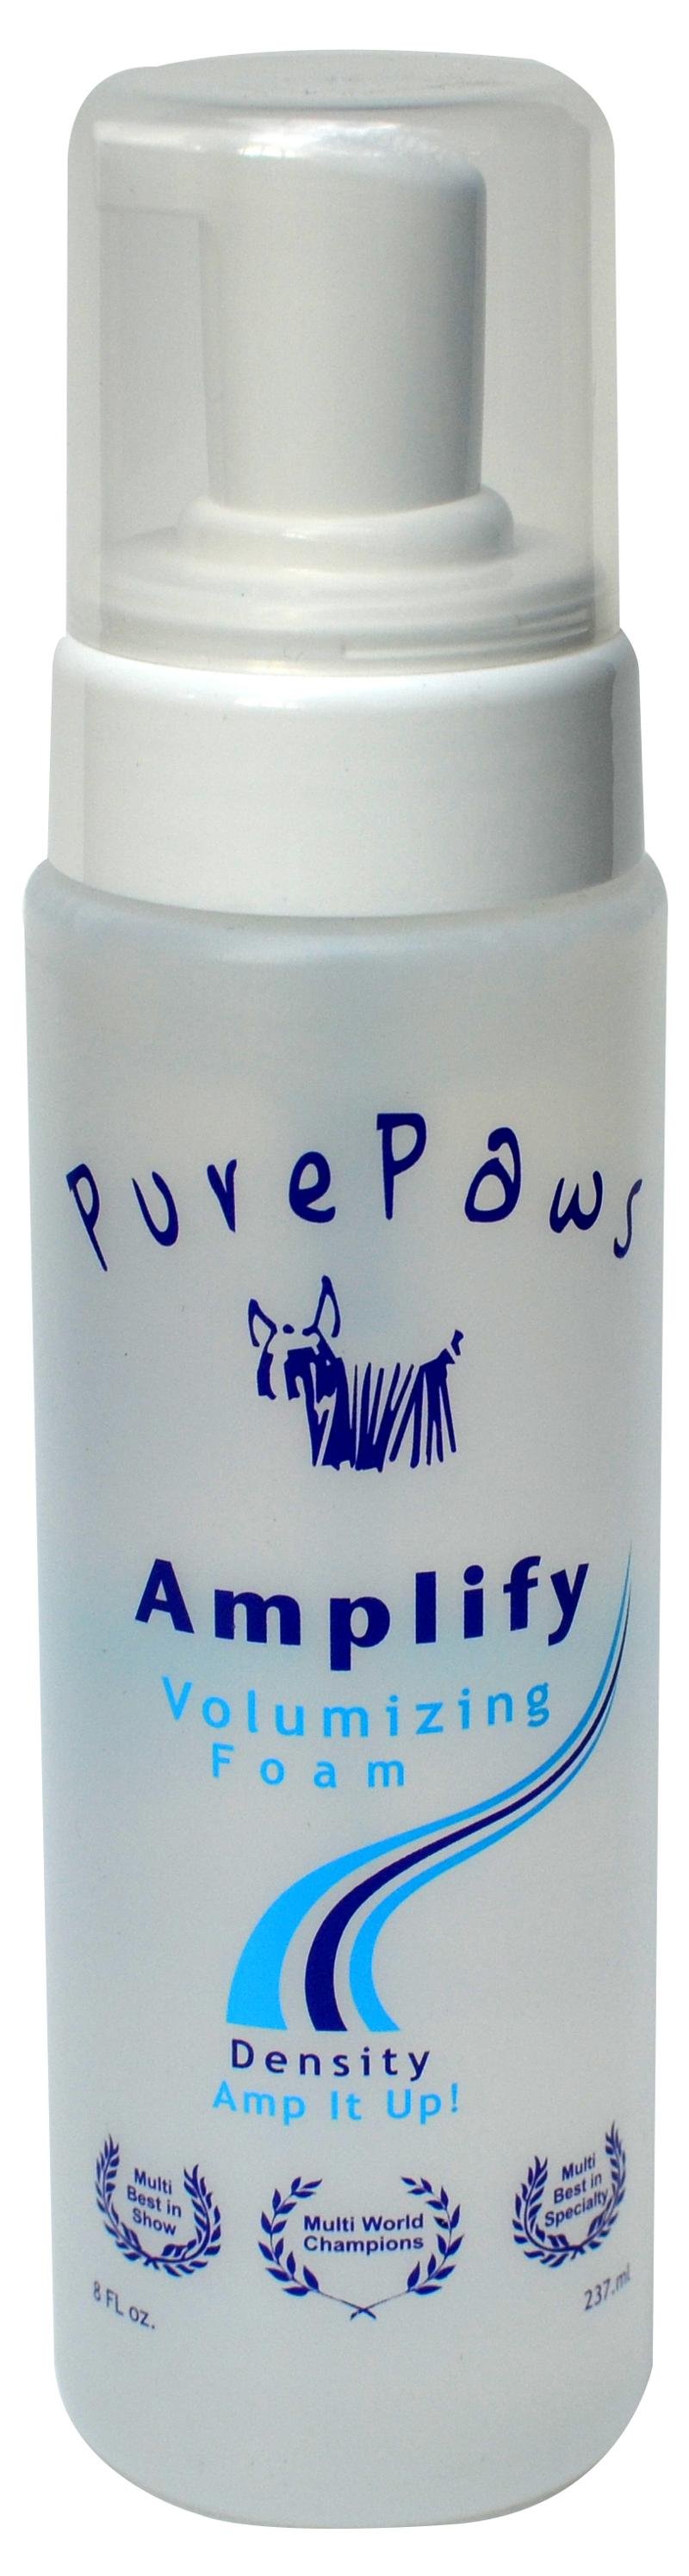 Amplify Volumizing Foam